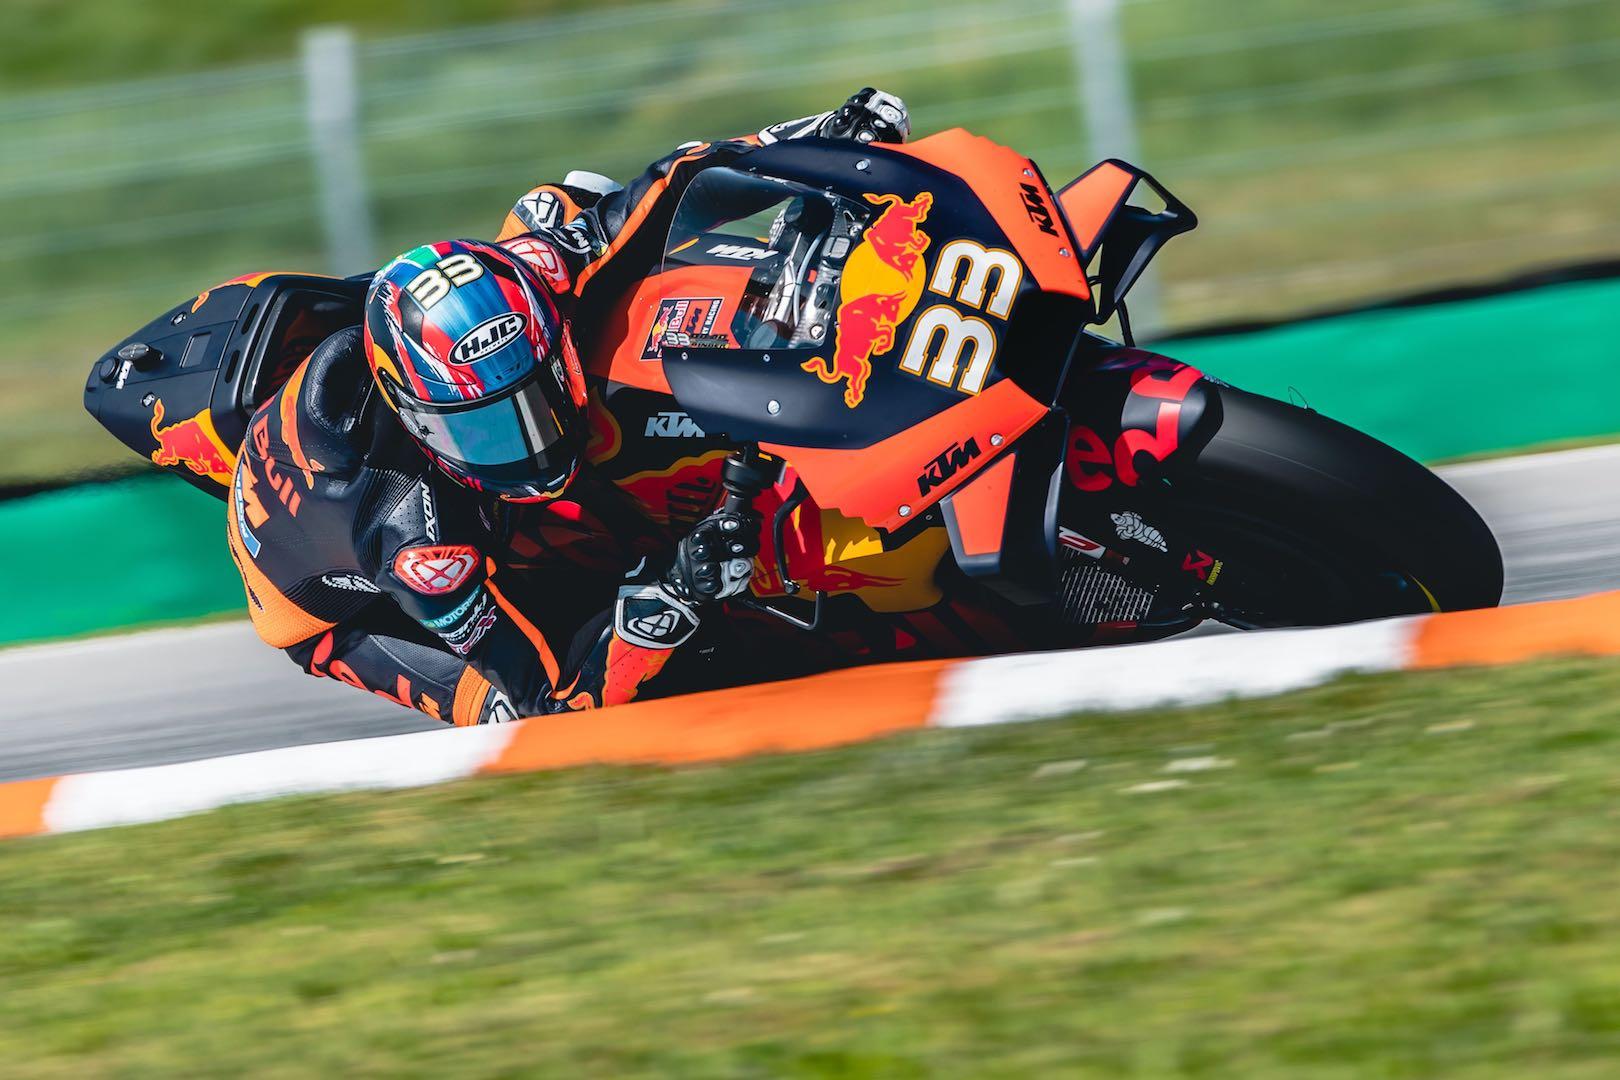 KTM, Rookie Binder, and South Africa Make MotoGP History